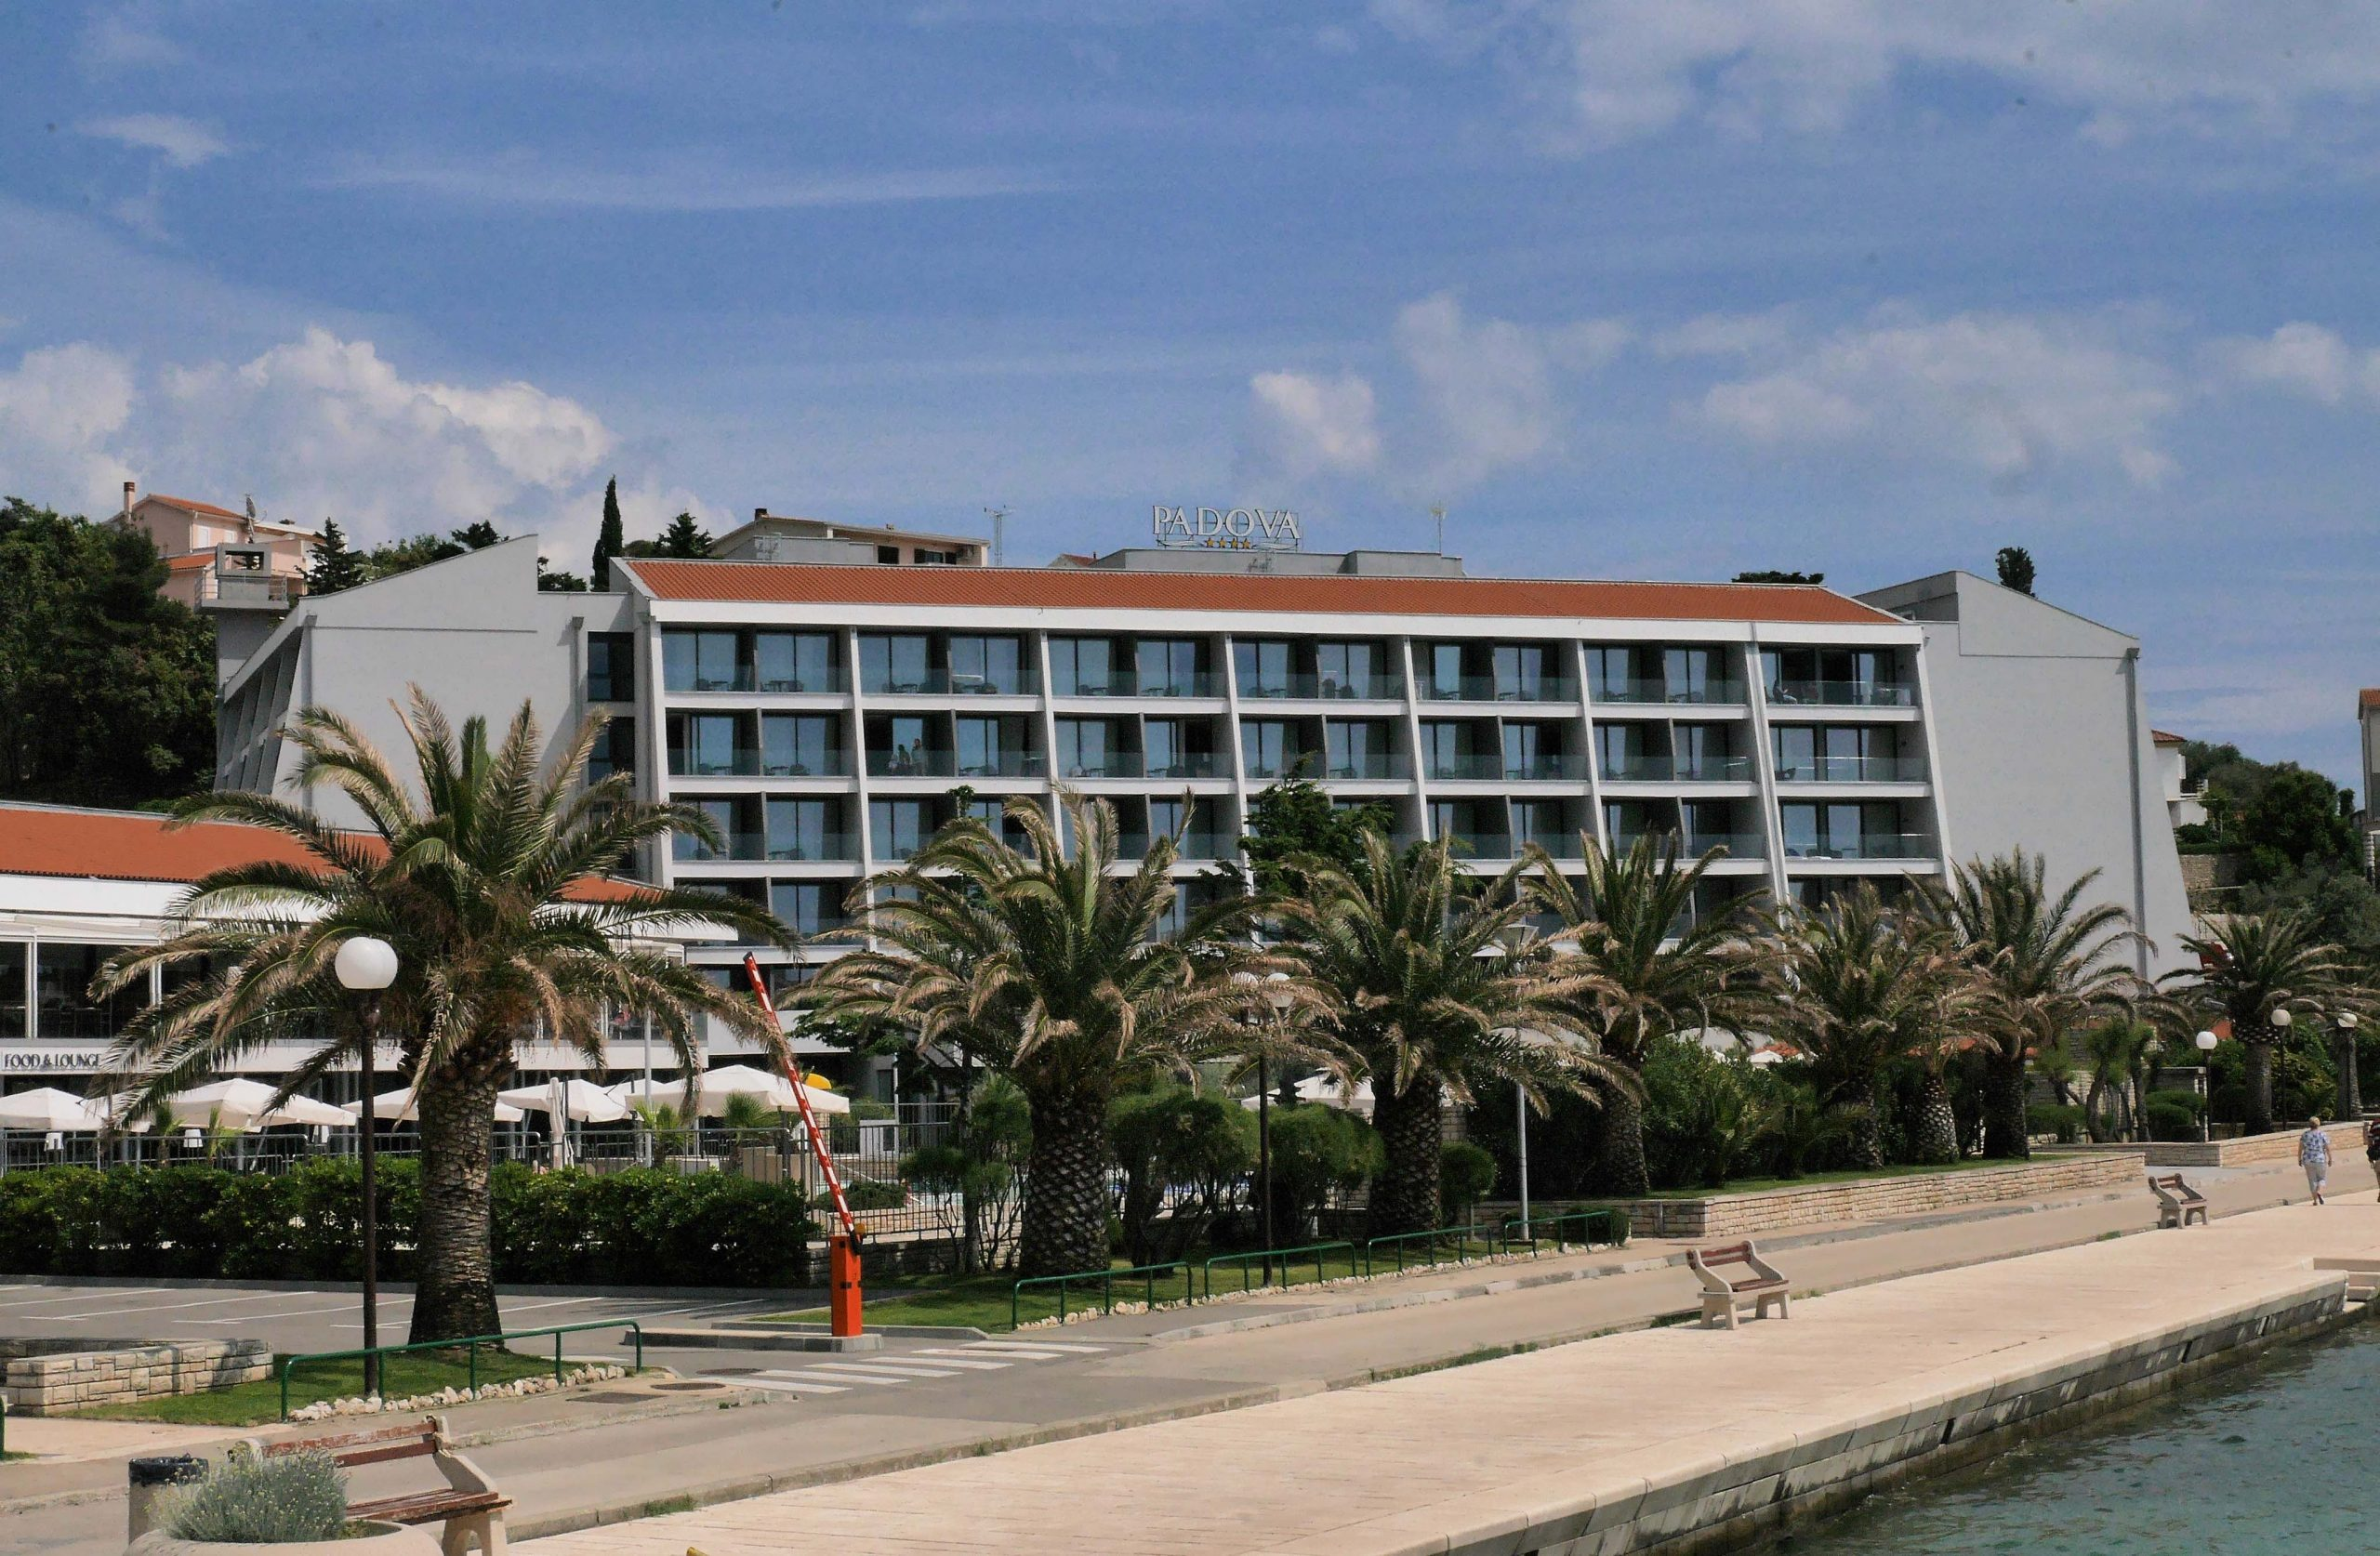 Hotel Padova sada je dio tvrtke Imperial Riviera d.d. / Snimio Marin ANIČIĆ